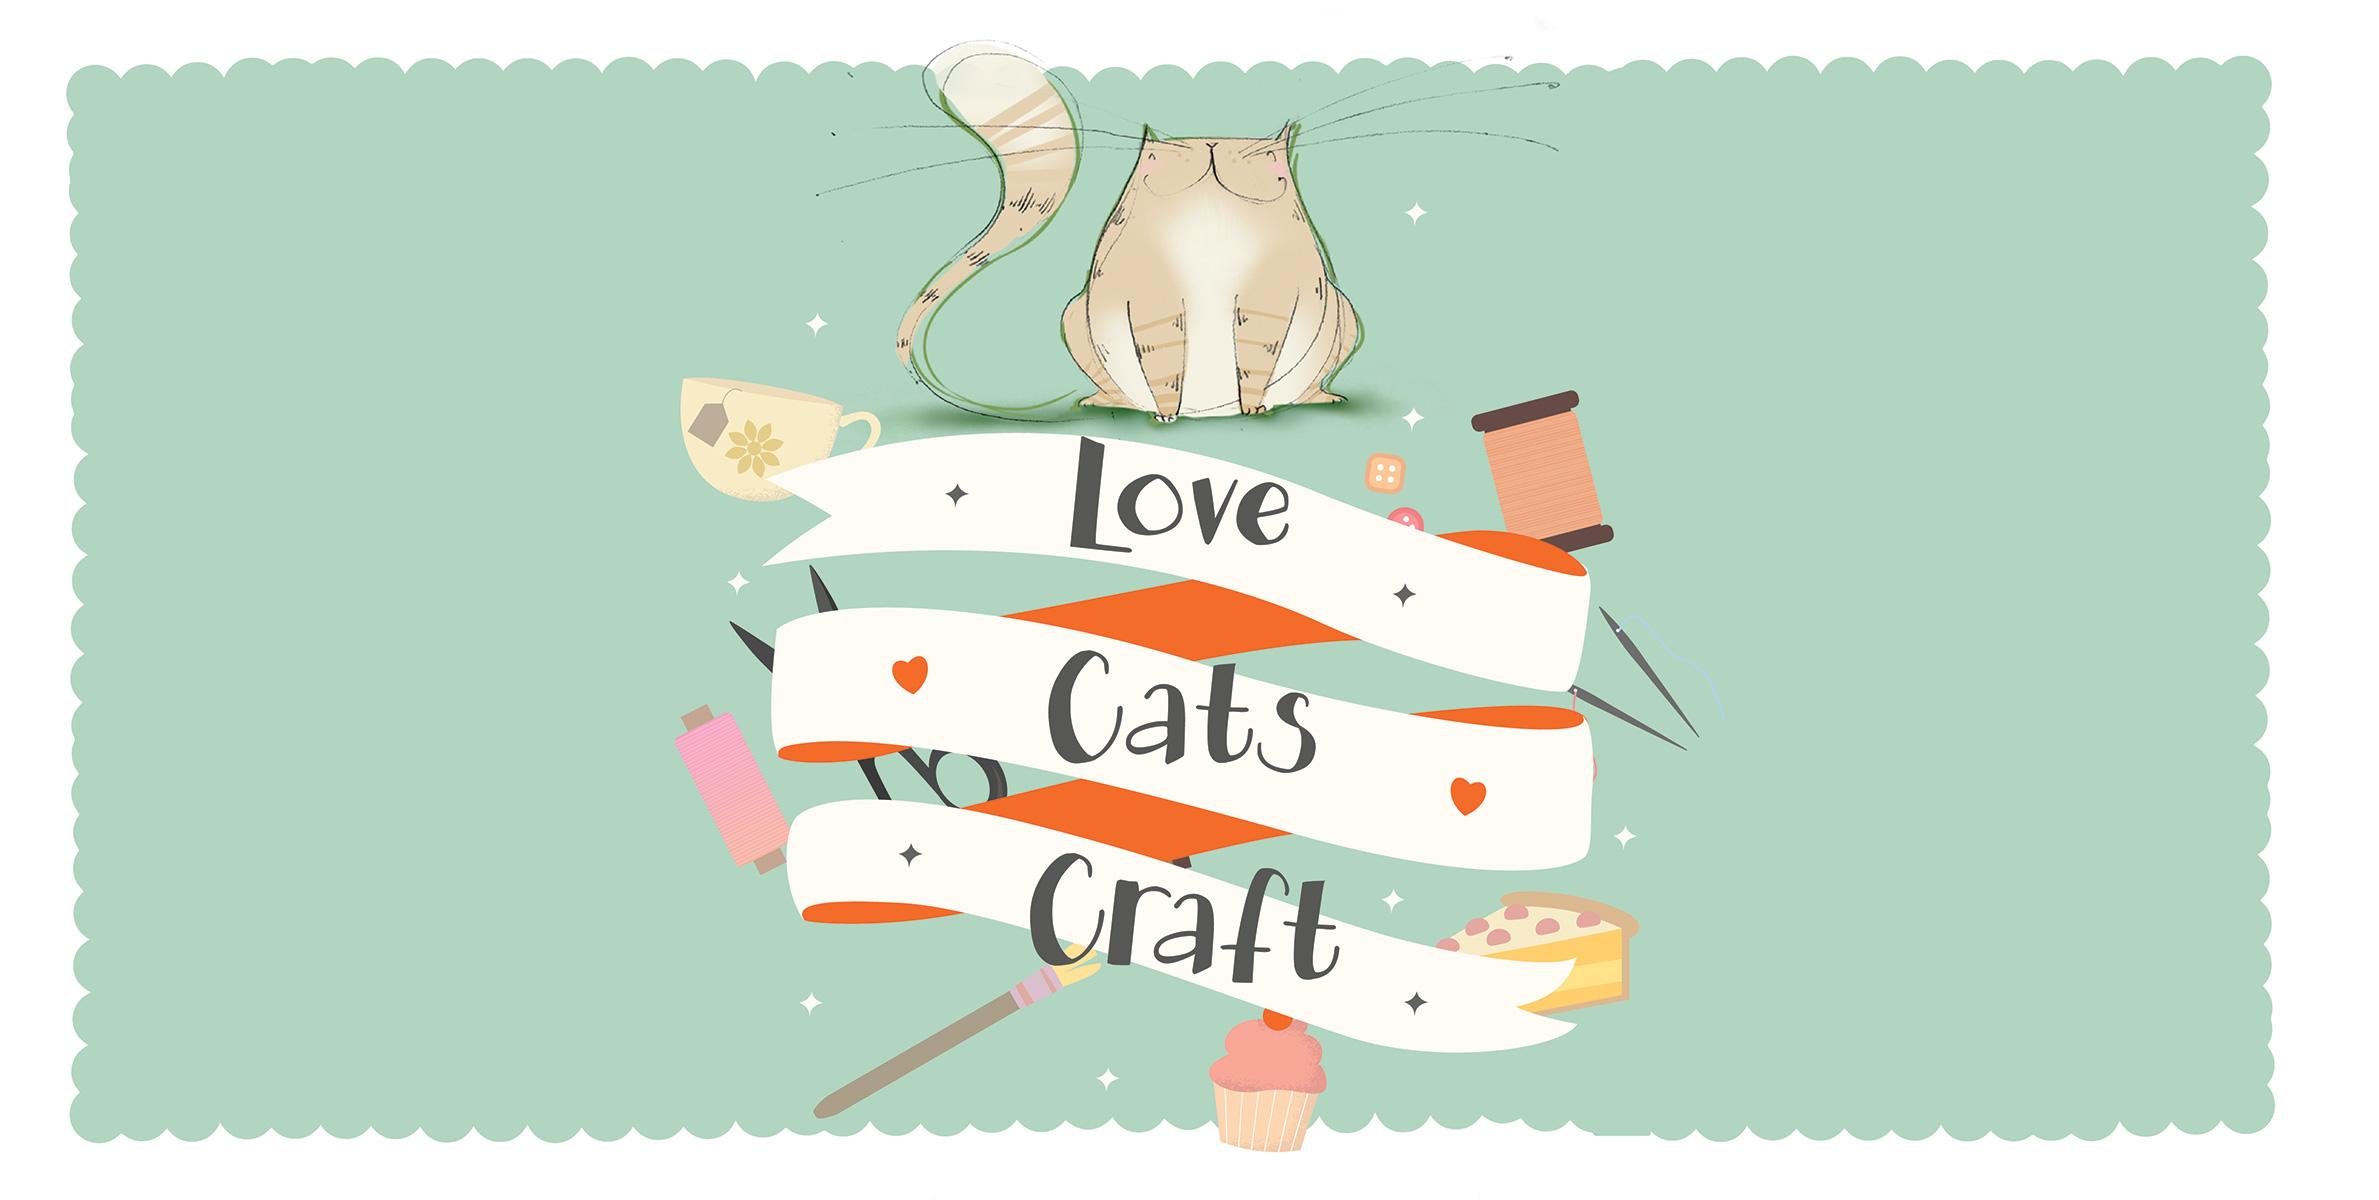 LoveCatsCraft-Banner-LandscapeArtwork-preview